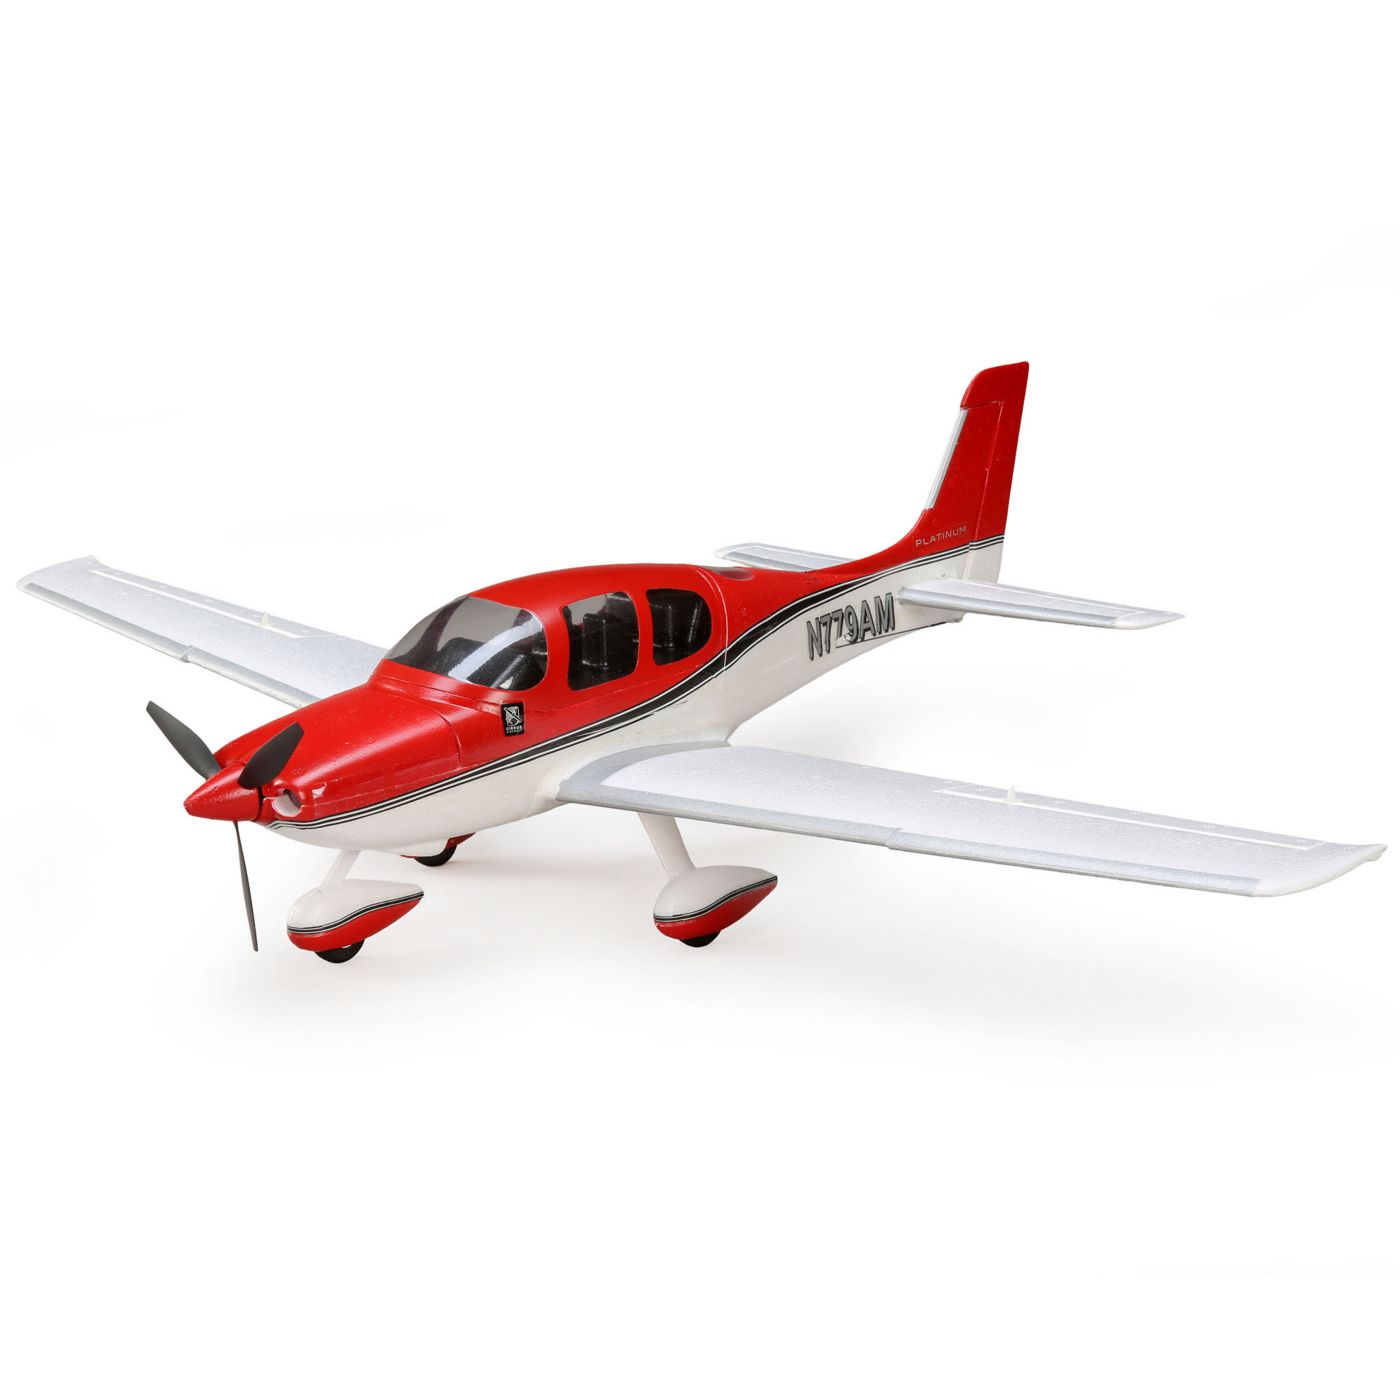 UMX Cirrus SR22T E-flite